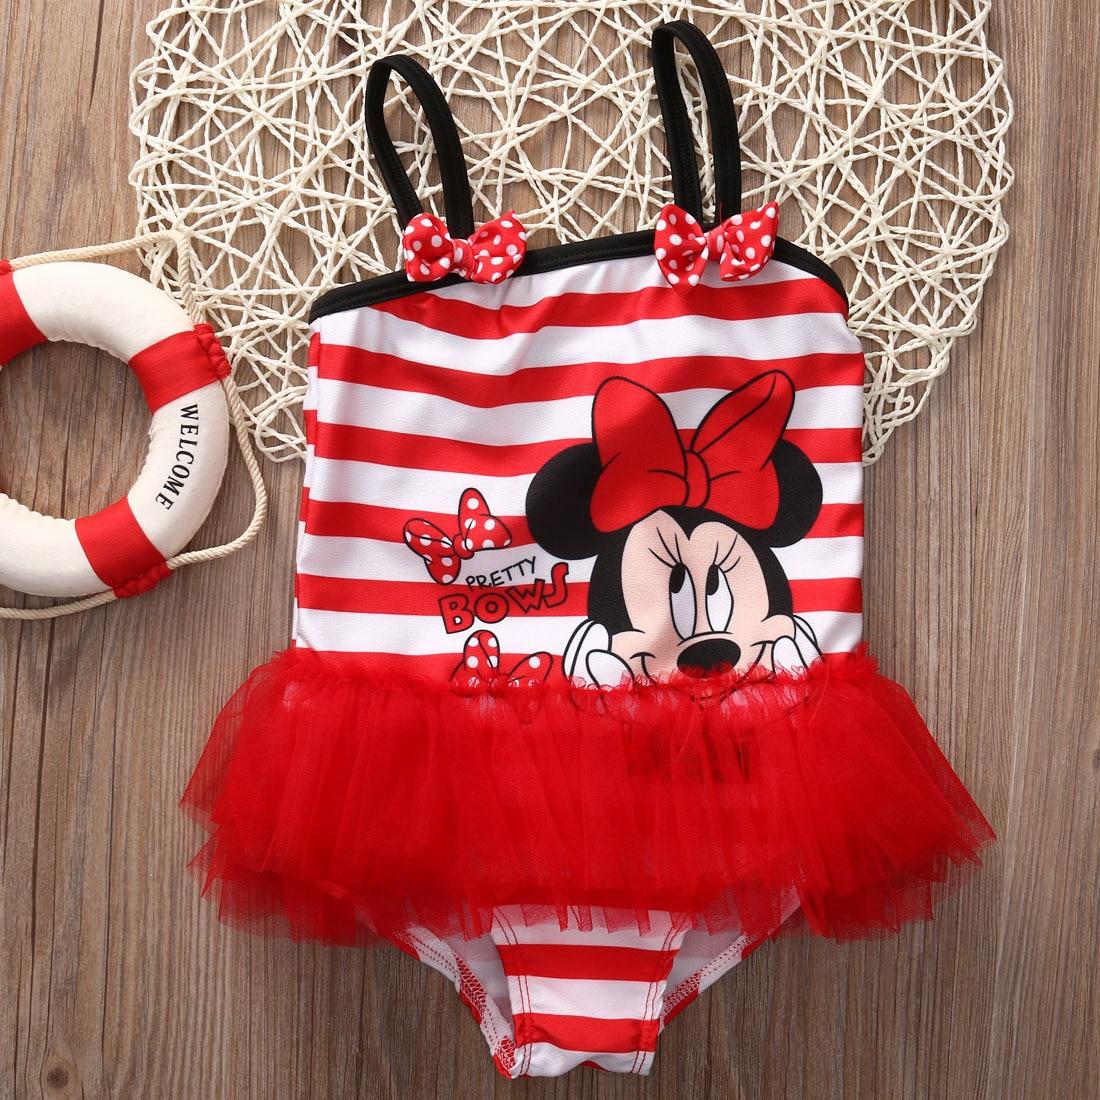 Child Baby Kids Girl Striped Minnie One Piece Swimsuit Swimwear Monokini Bikini Bathing Suit Tutu Swimsuit